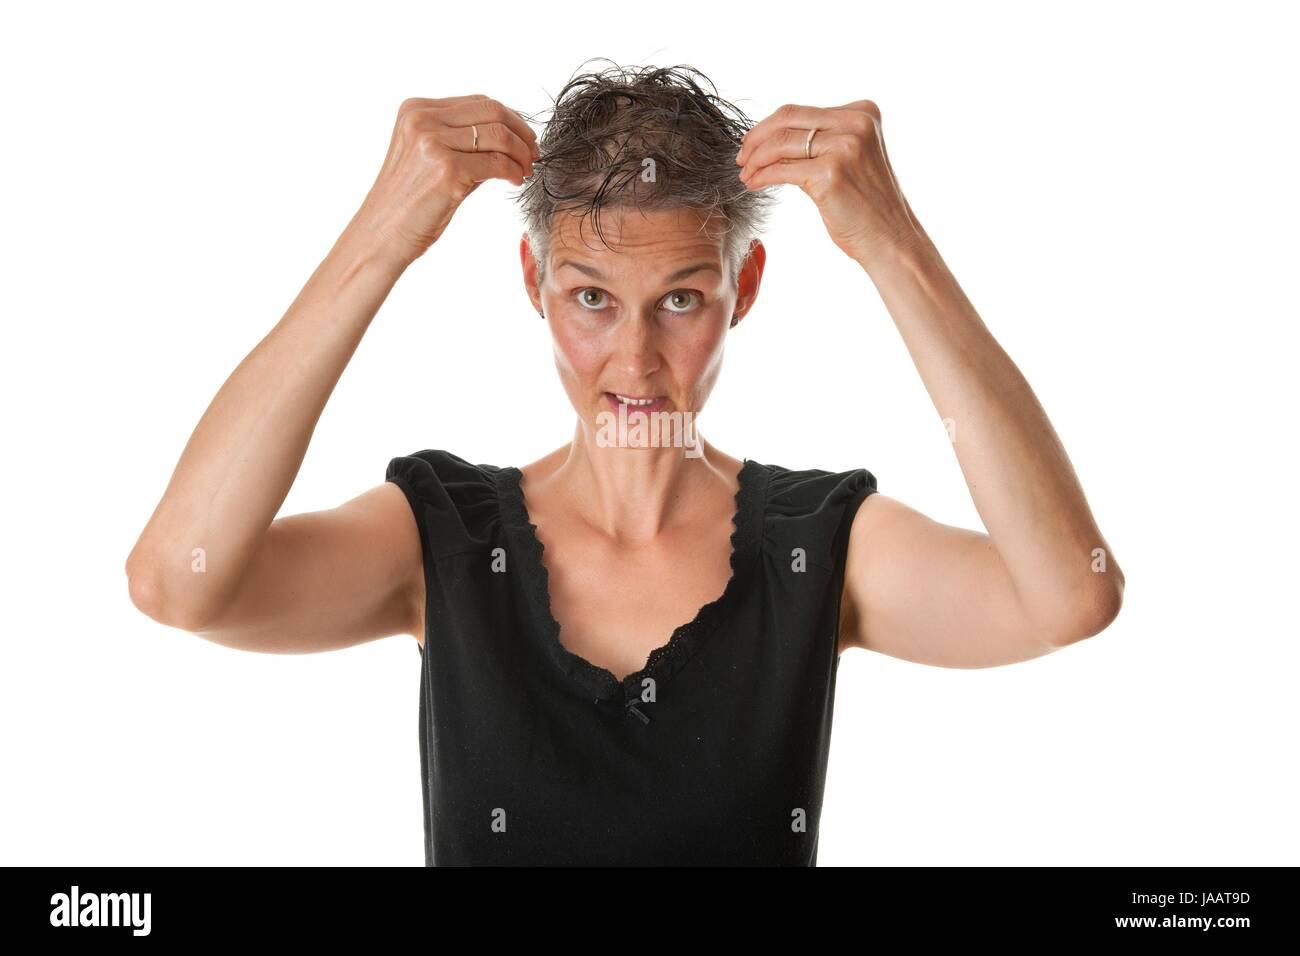 wechseljahre haarausfall hormone